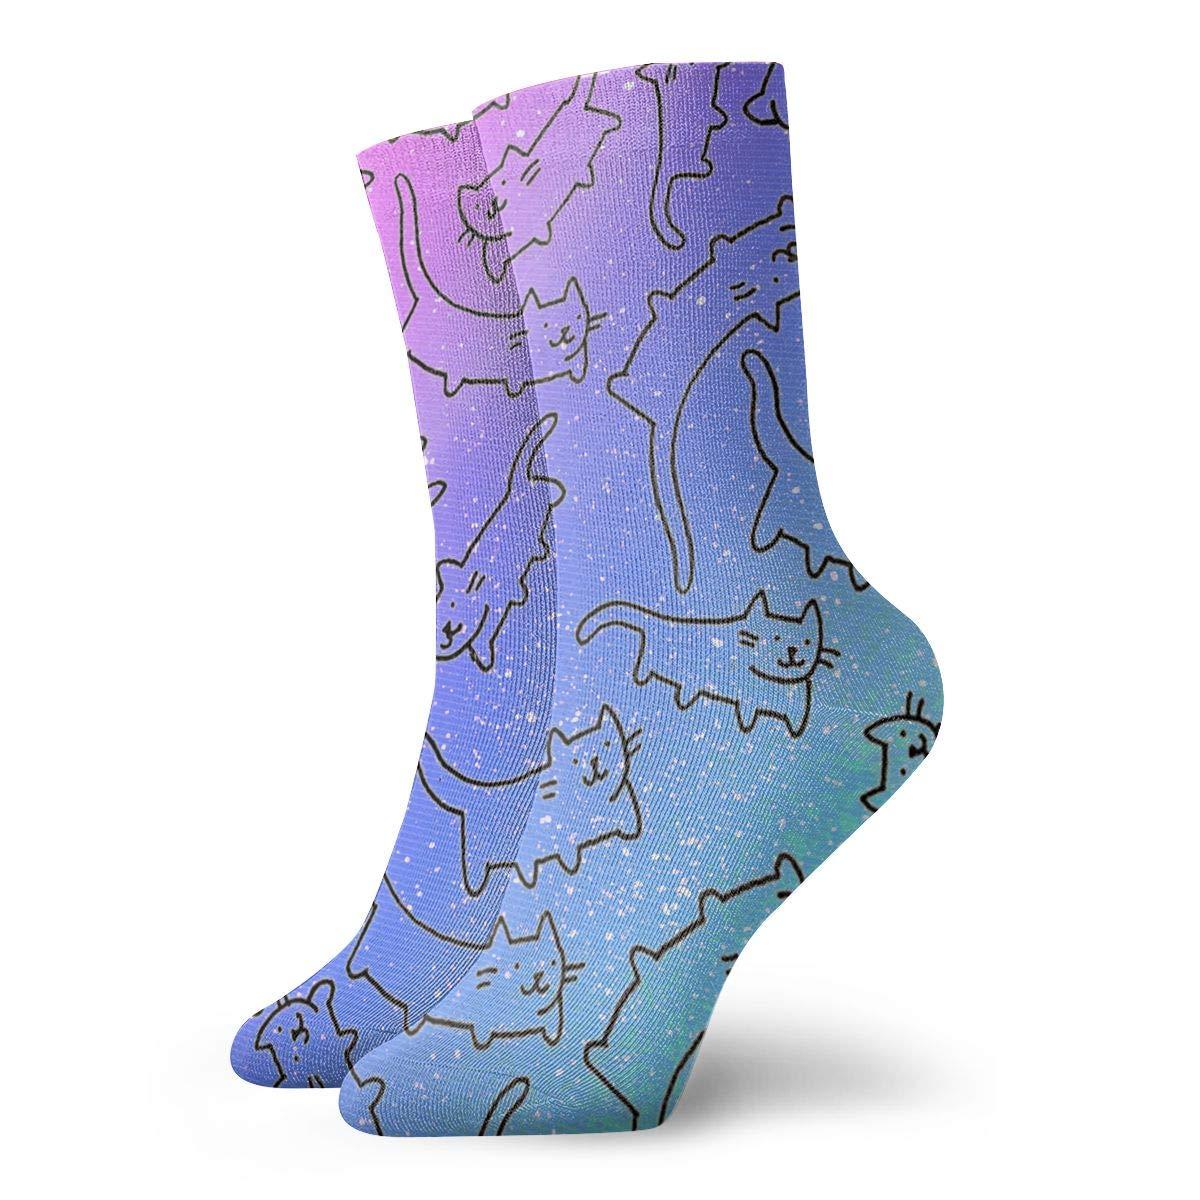 Cat Unisex Funny Casual Crew Socks Athletic Socks For Boys Girls Kids Teenagers